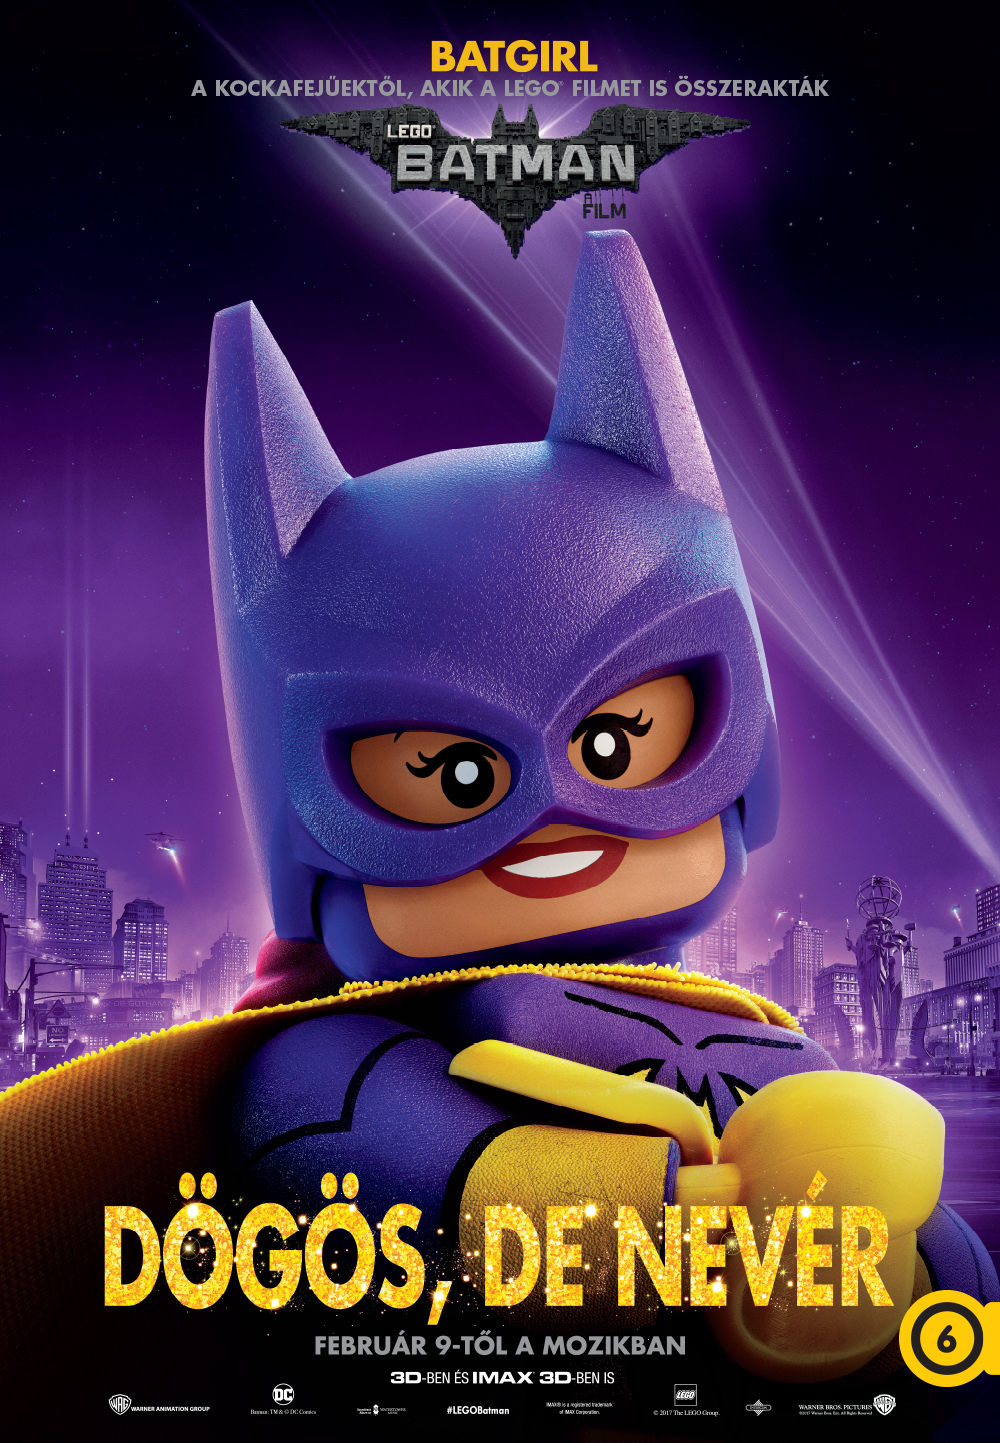 Batgirl/Barbara Gordon (Rosario Dawson, magyar hangja Kéri Kitty)